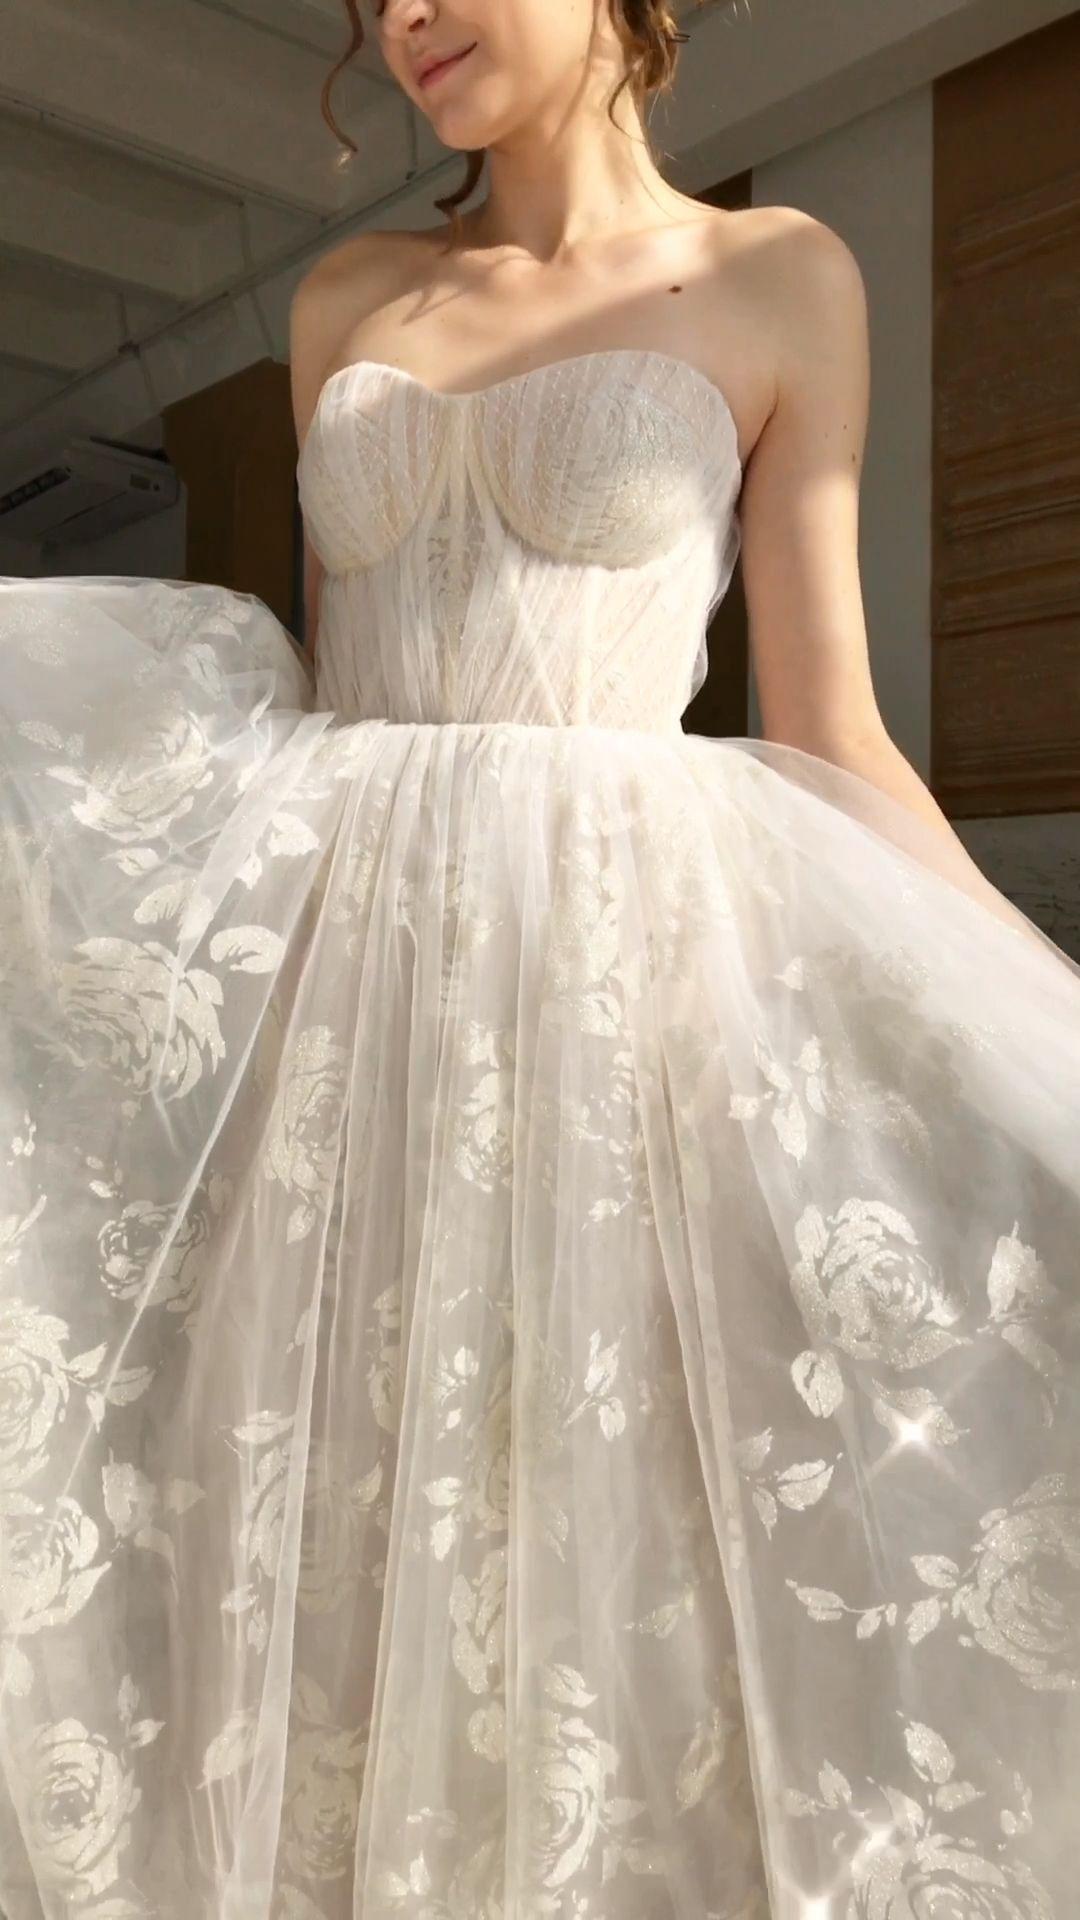 Shimmer glitter wedding dress with roses